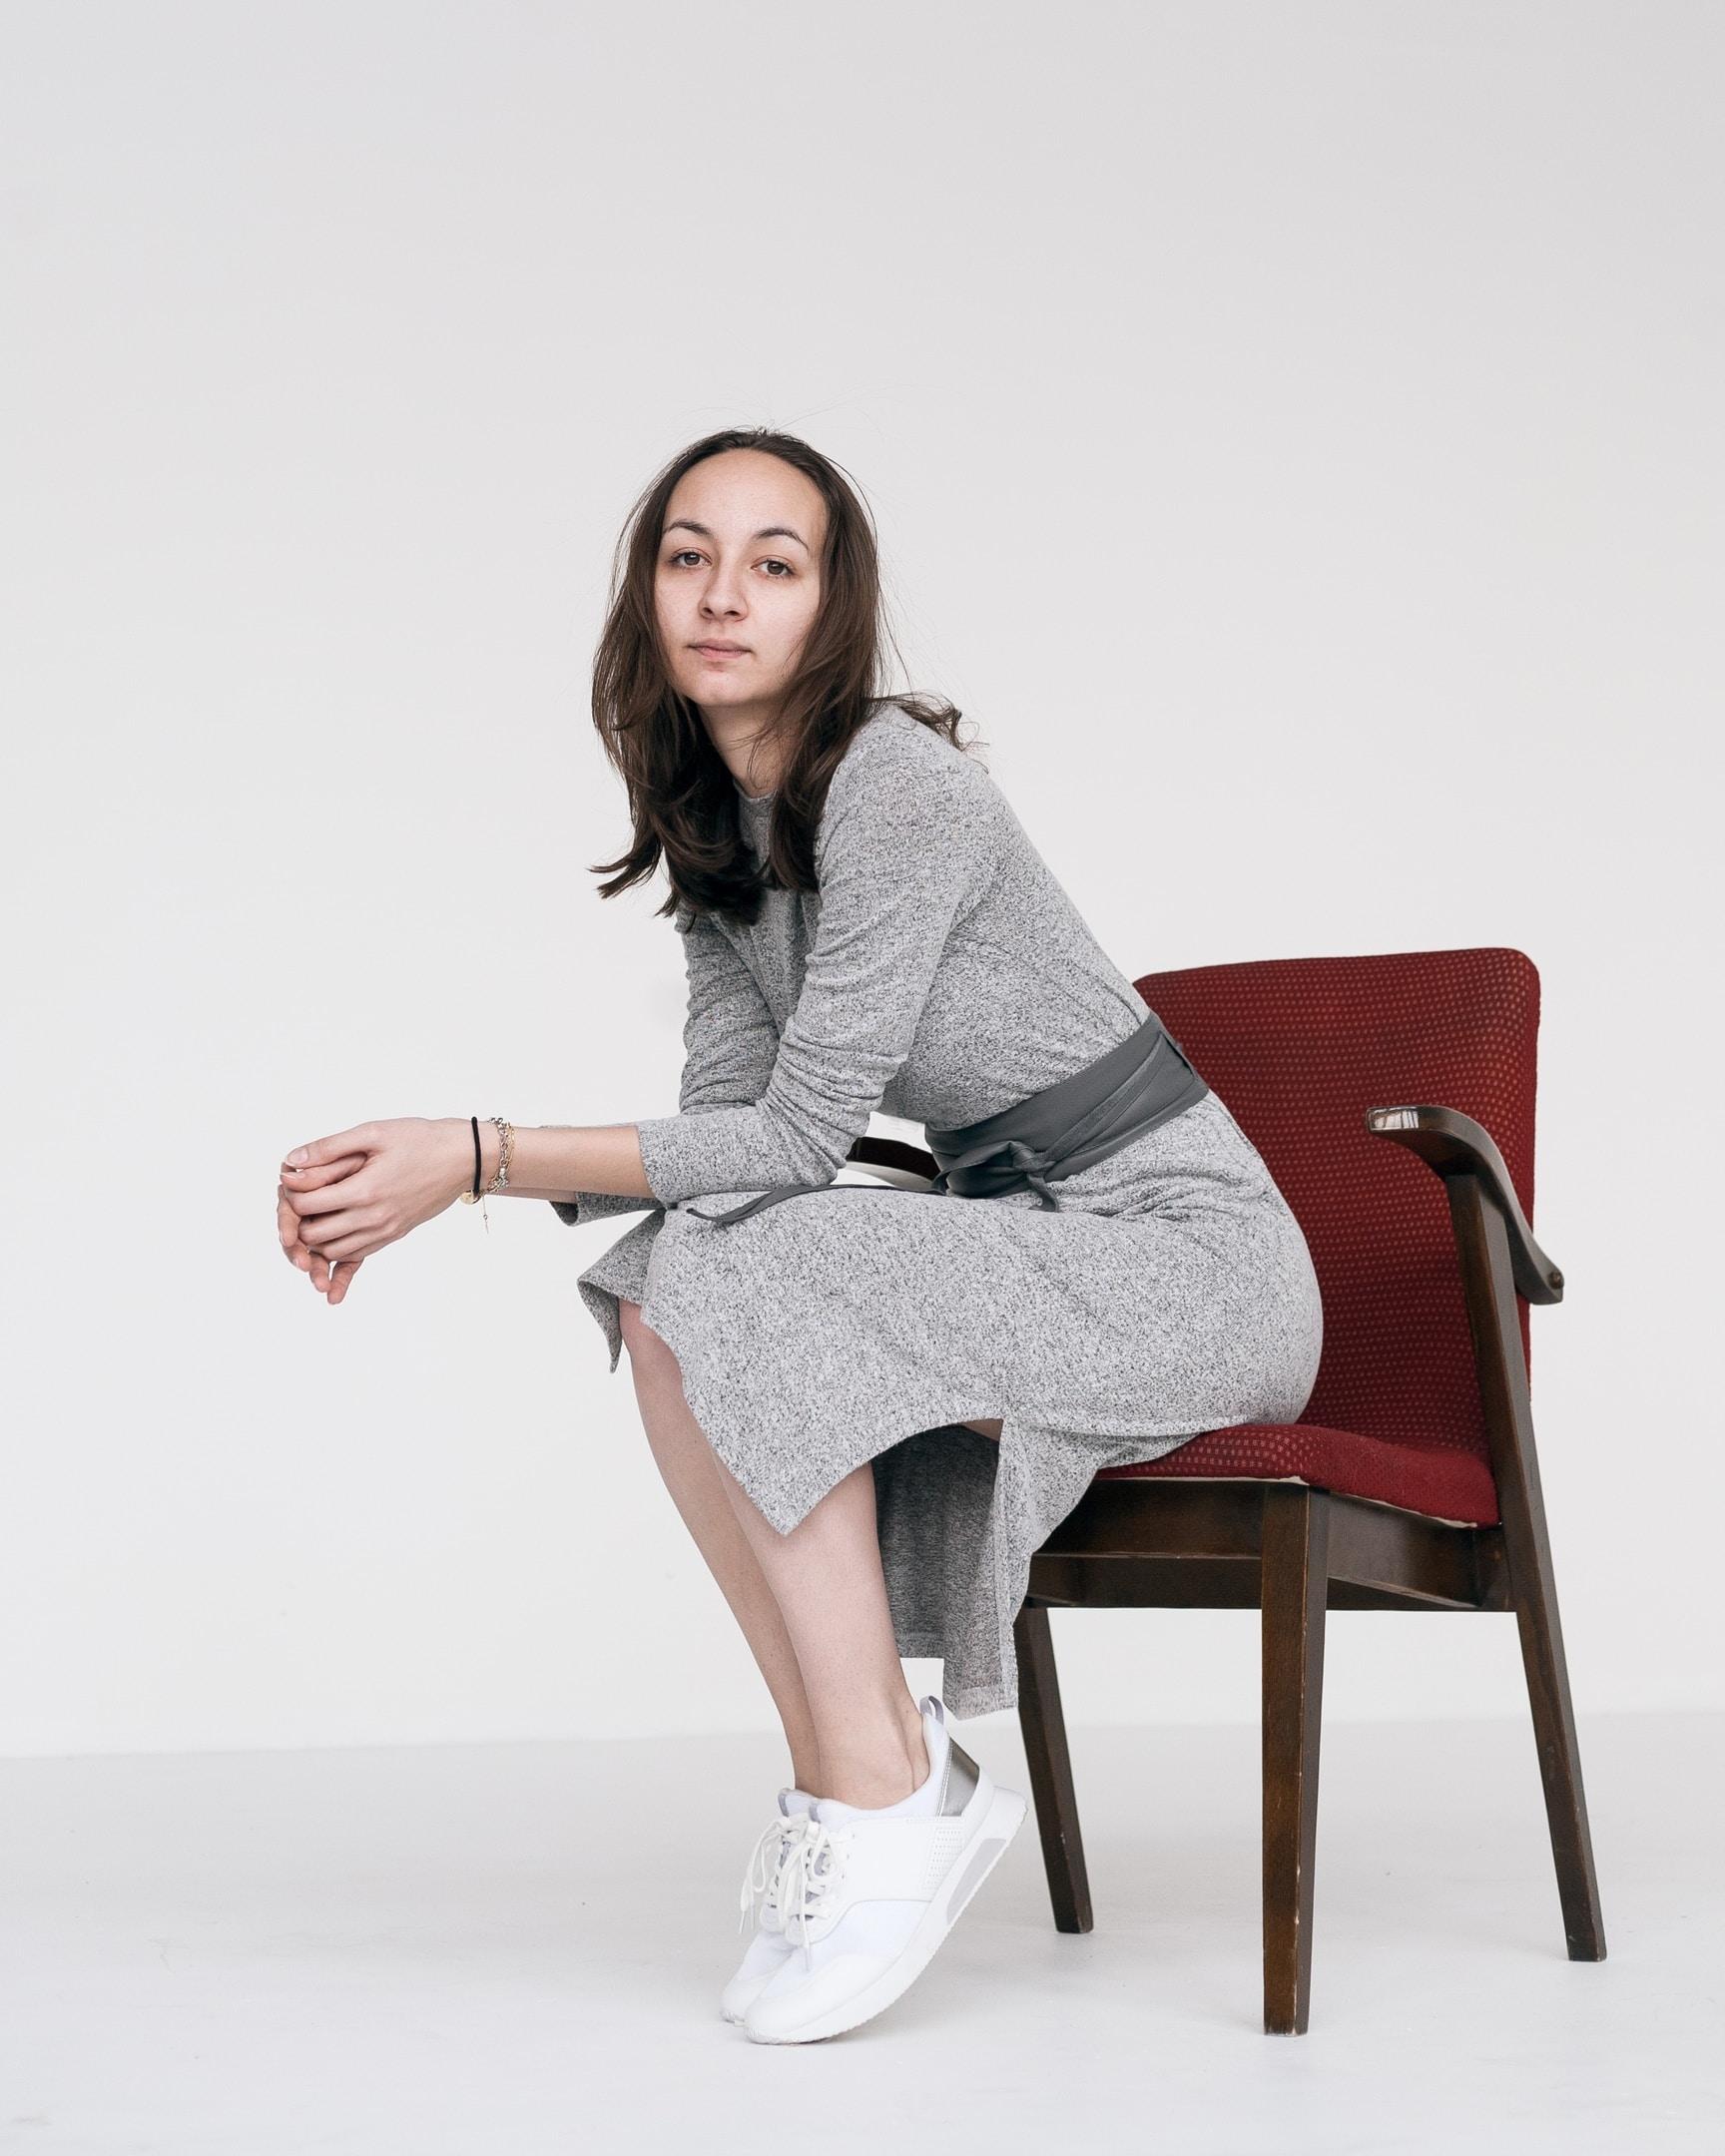 Go to Anastasiia Vasileva's profile